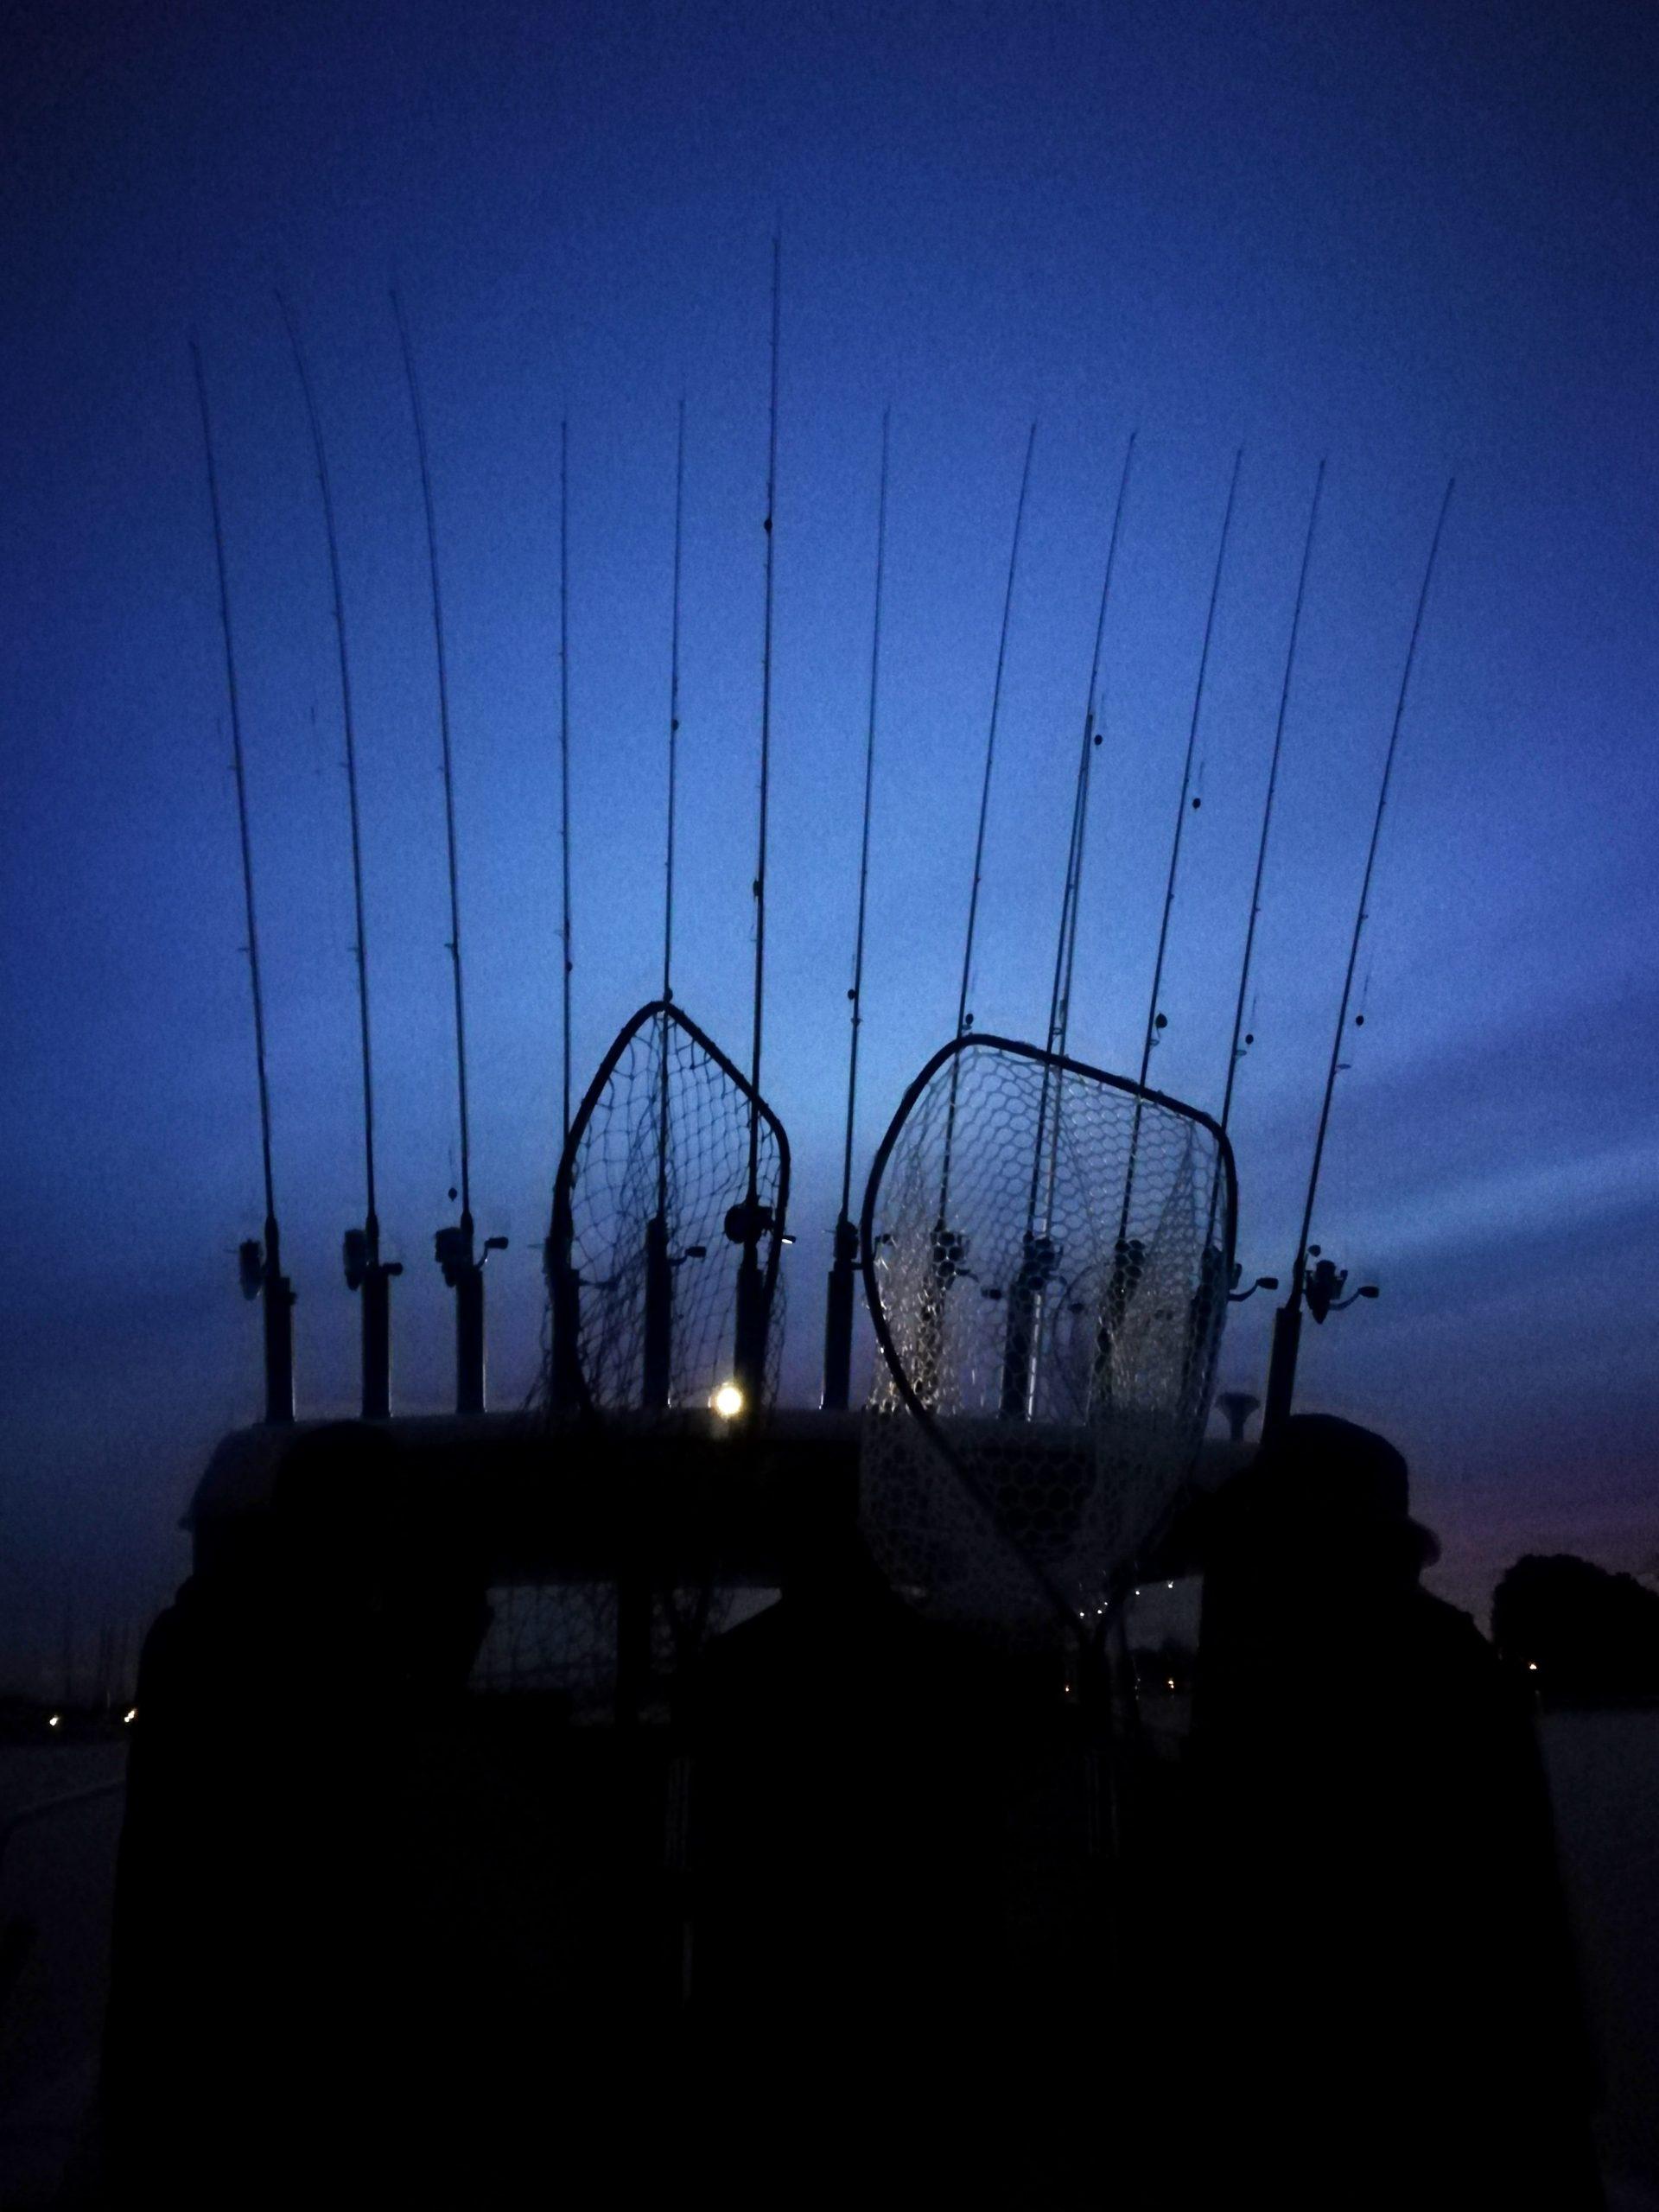 Captain Hook Fishing Charter Port Clinton Ohio